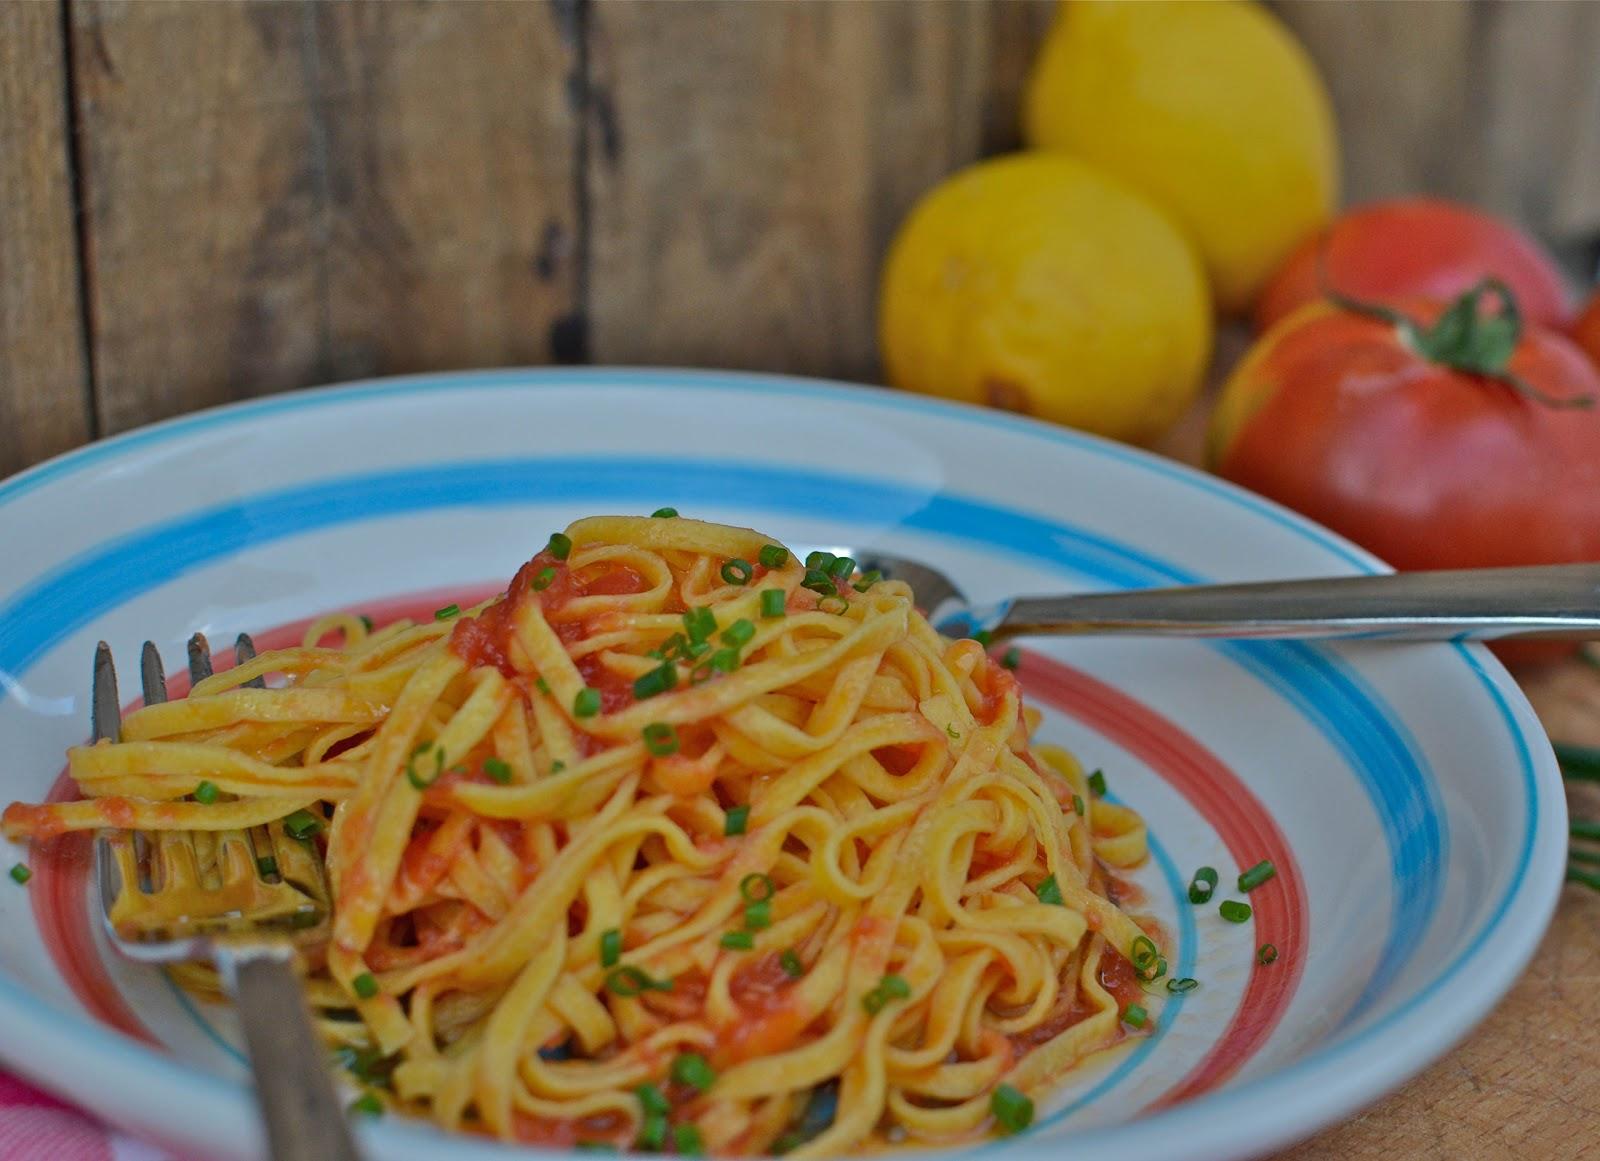 La Tavola MarcheSimple Summer Pasta SauceRaw Tomato with Lemon